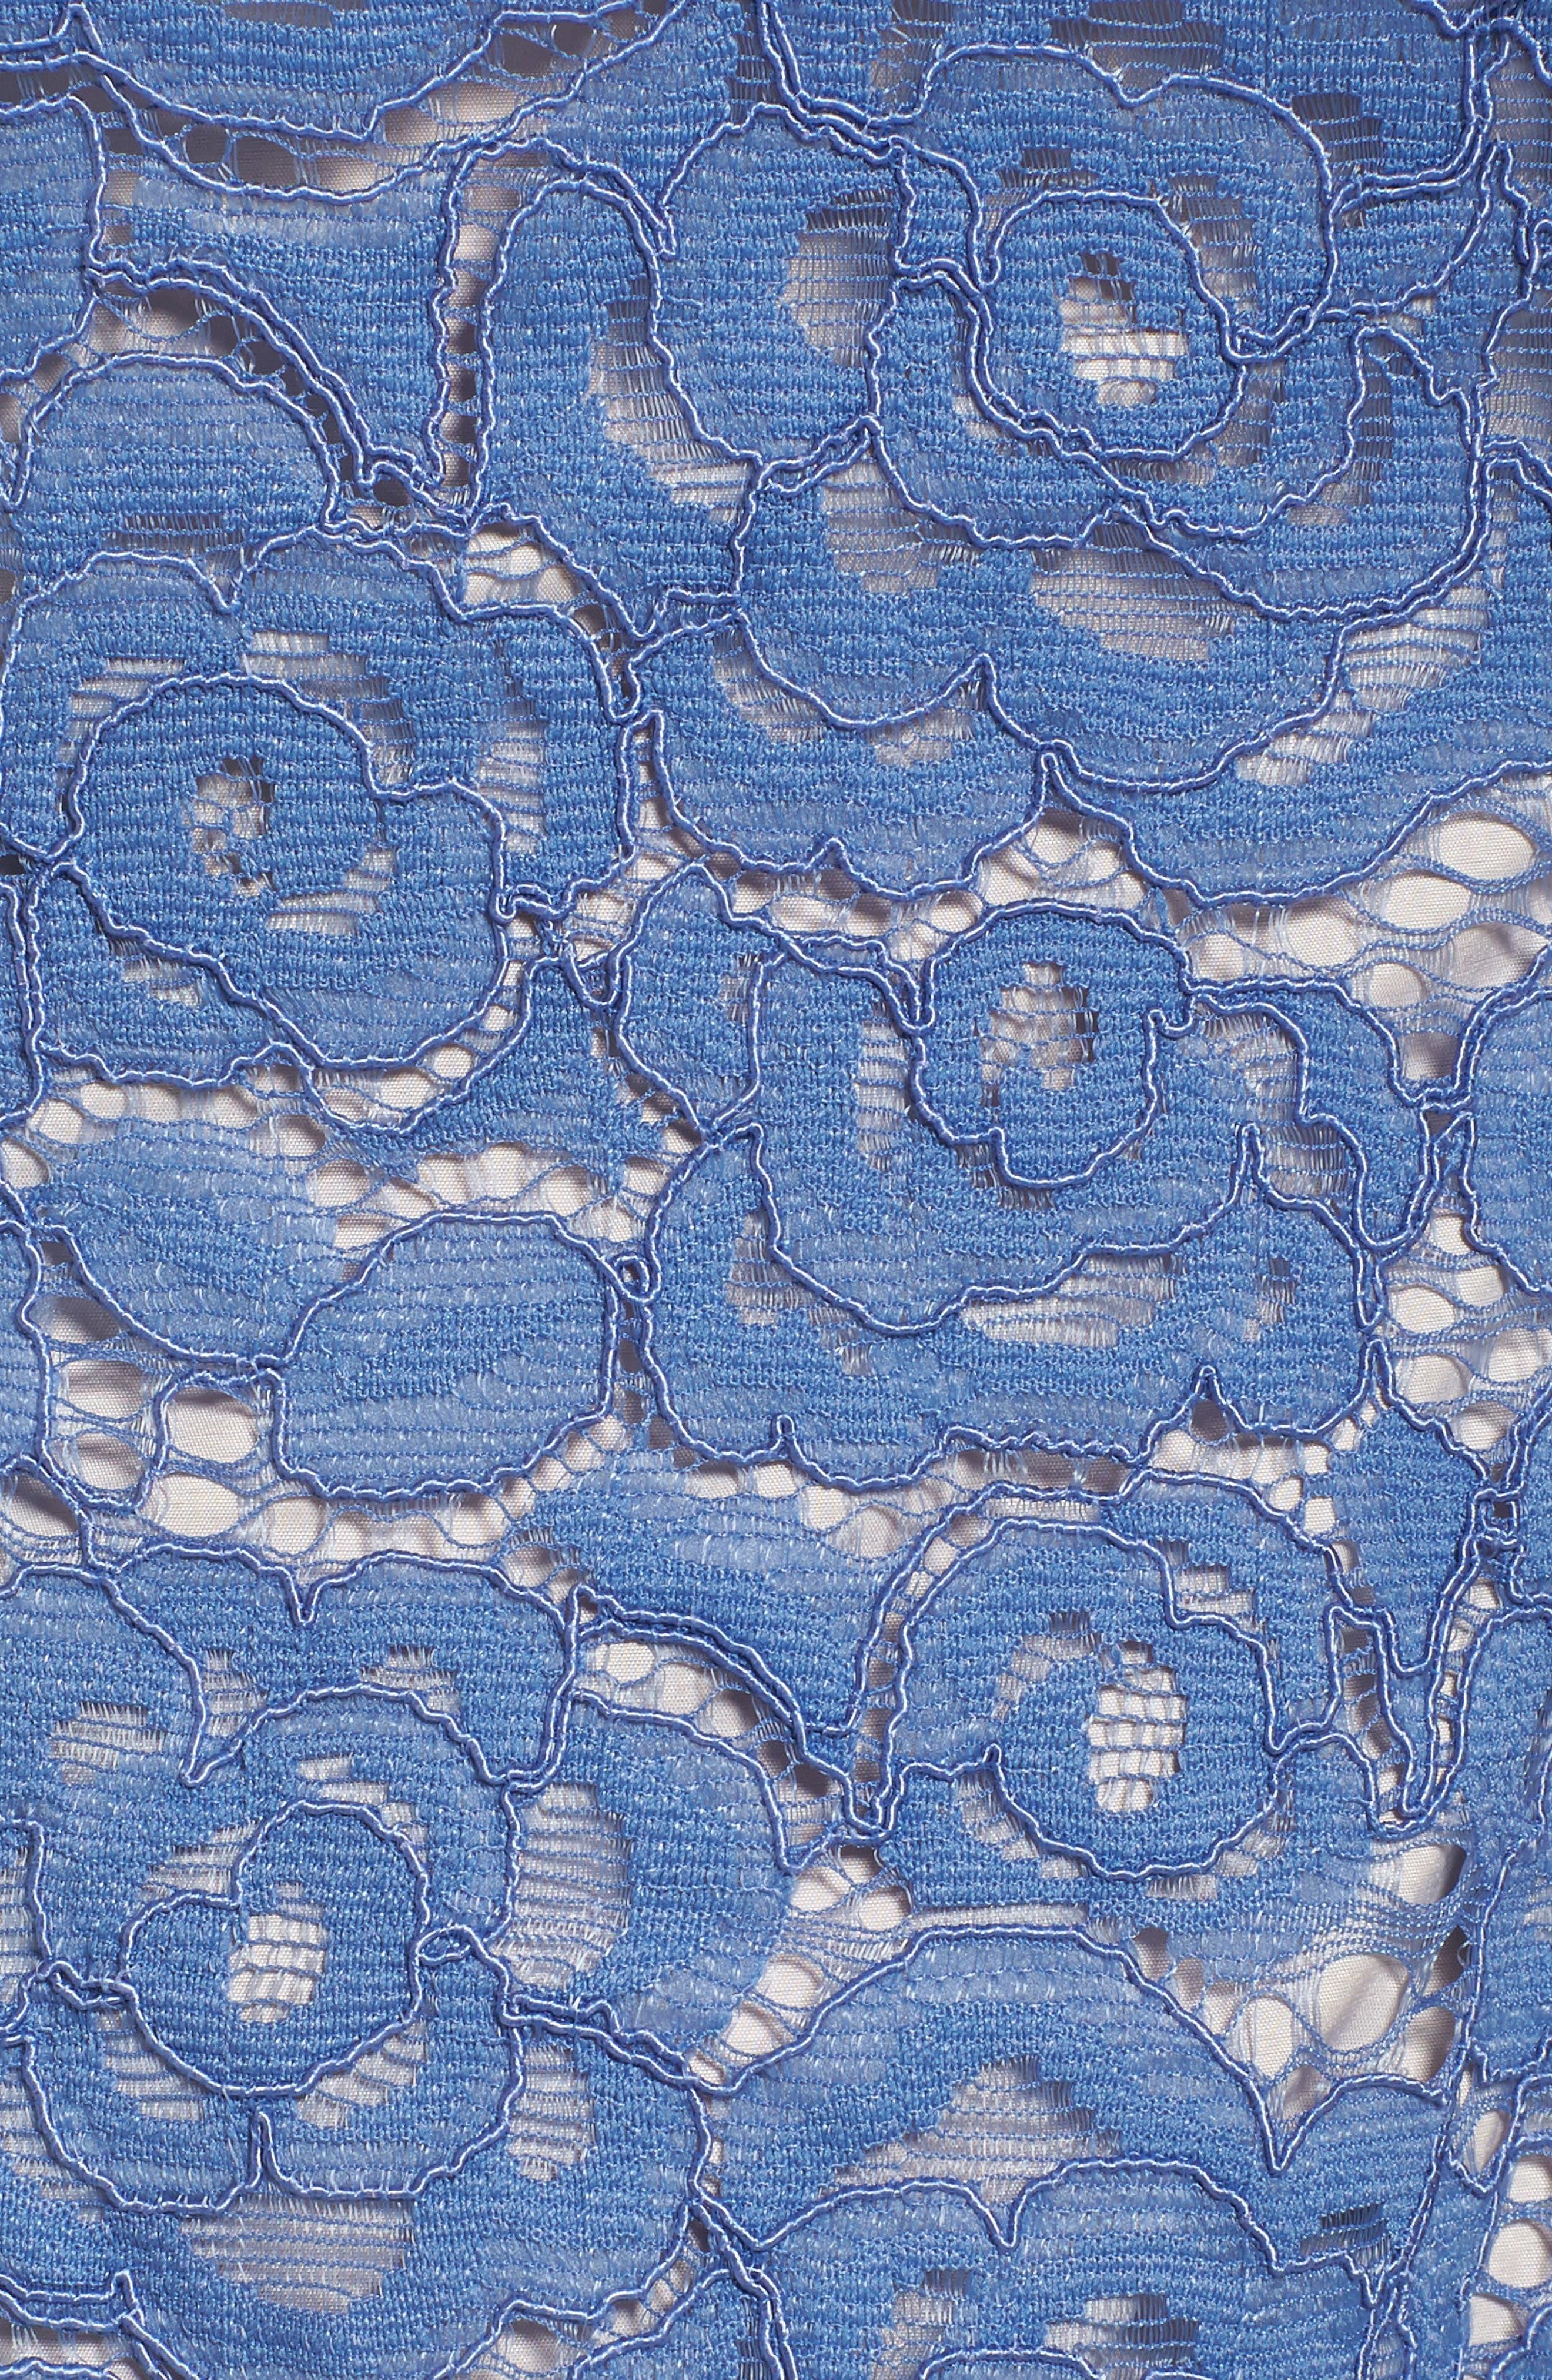 Off the Shoulder Lace Sheath Dress,                             Alternate thumbnail 26, color,